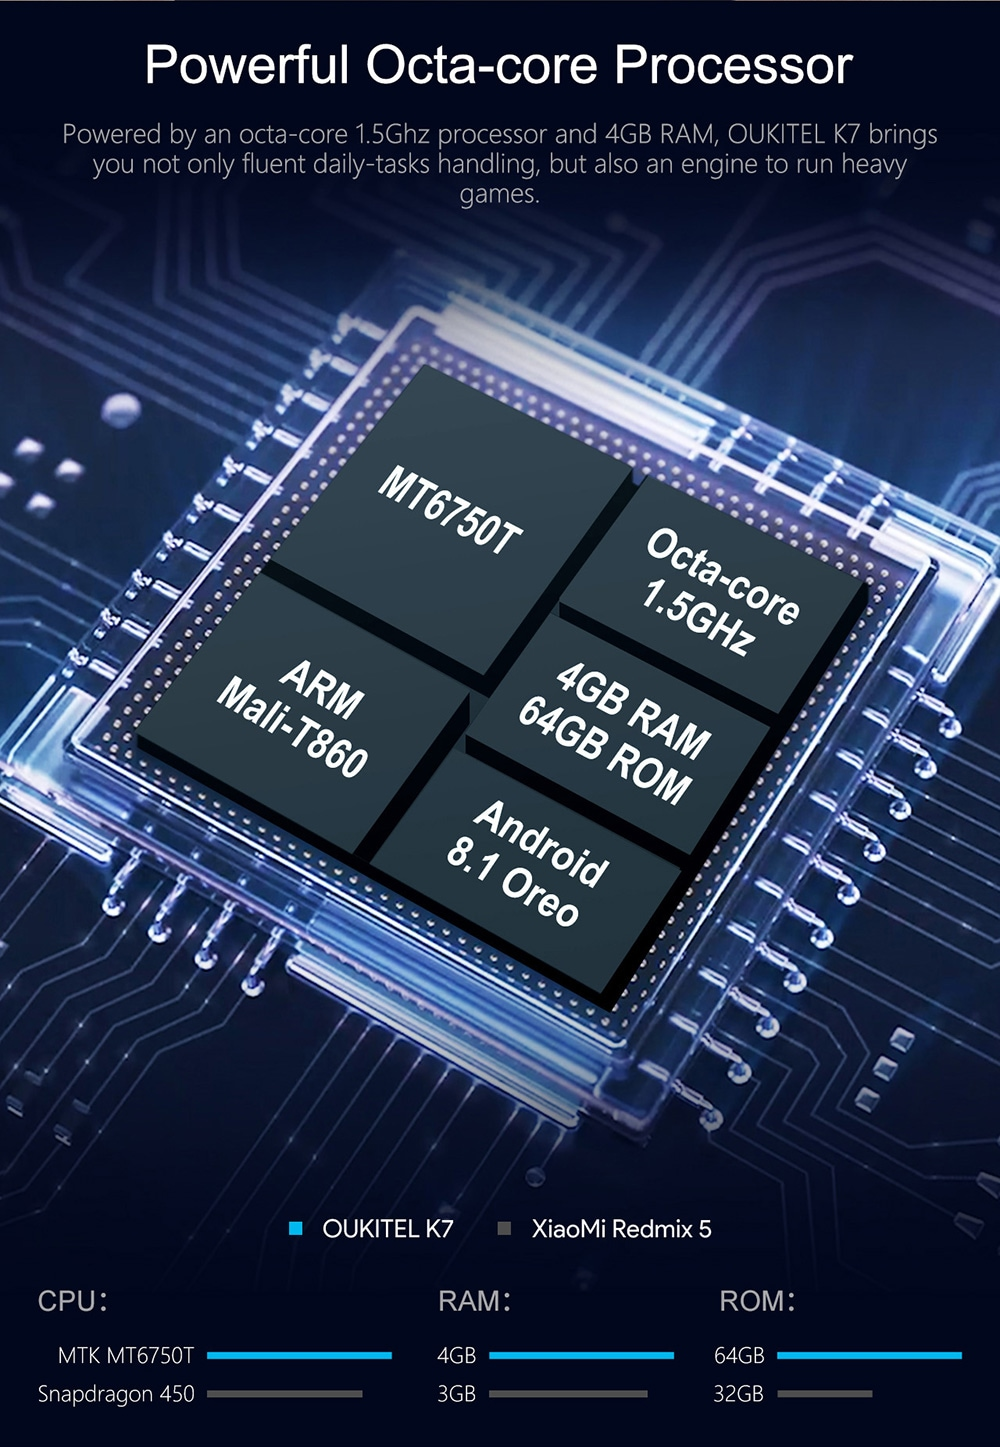 OUKITEL K7 4G Phablet 6.0 inch Android8.1 MTK6750T Octa Core 1.5GHz 4GB RAM 64GB ROM 13.0MP + 2.0MP Rear Camera Fingerprint Sensor 10000mAh Built-in - Black